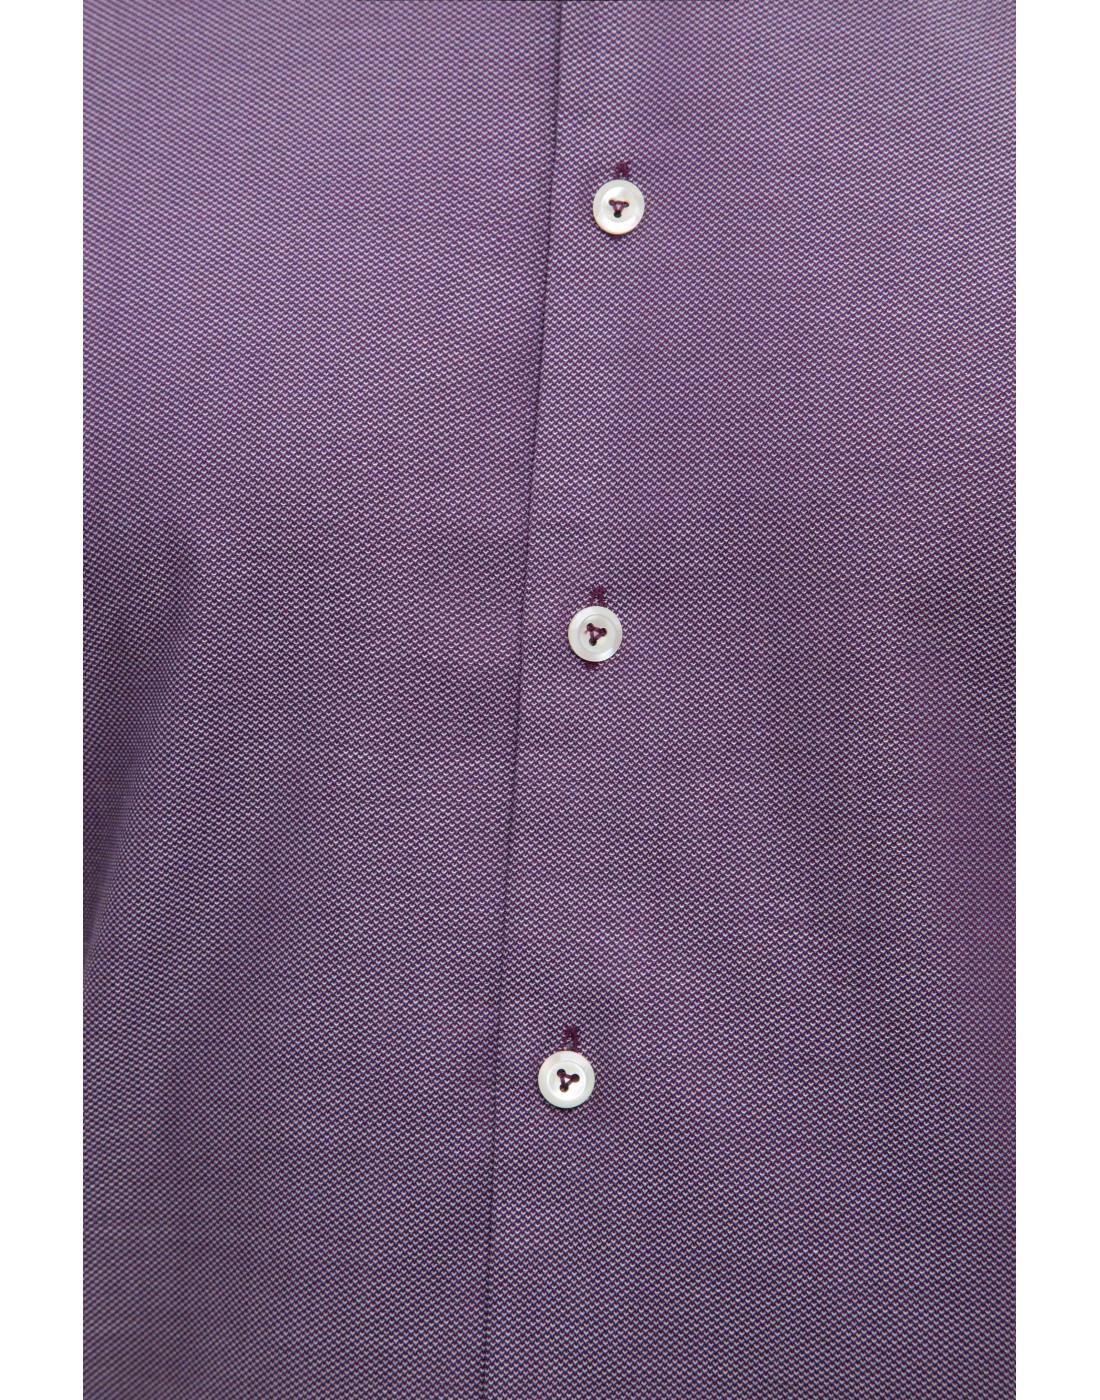 Мужская сиреневая рубашка Van Laack S151377/670-6